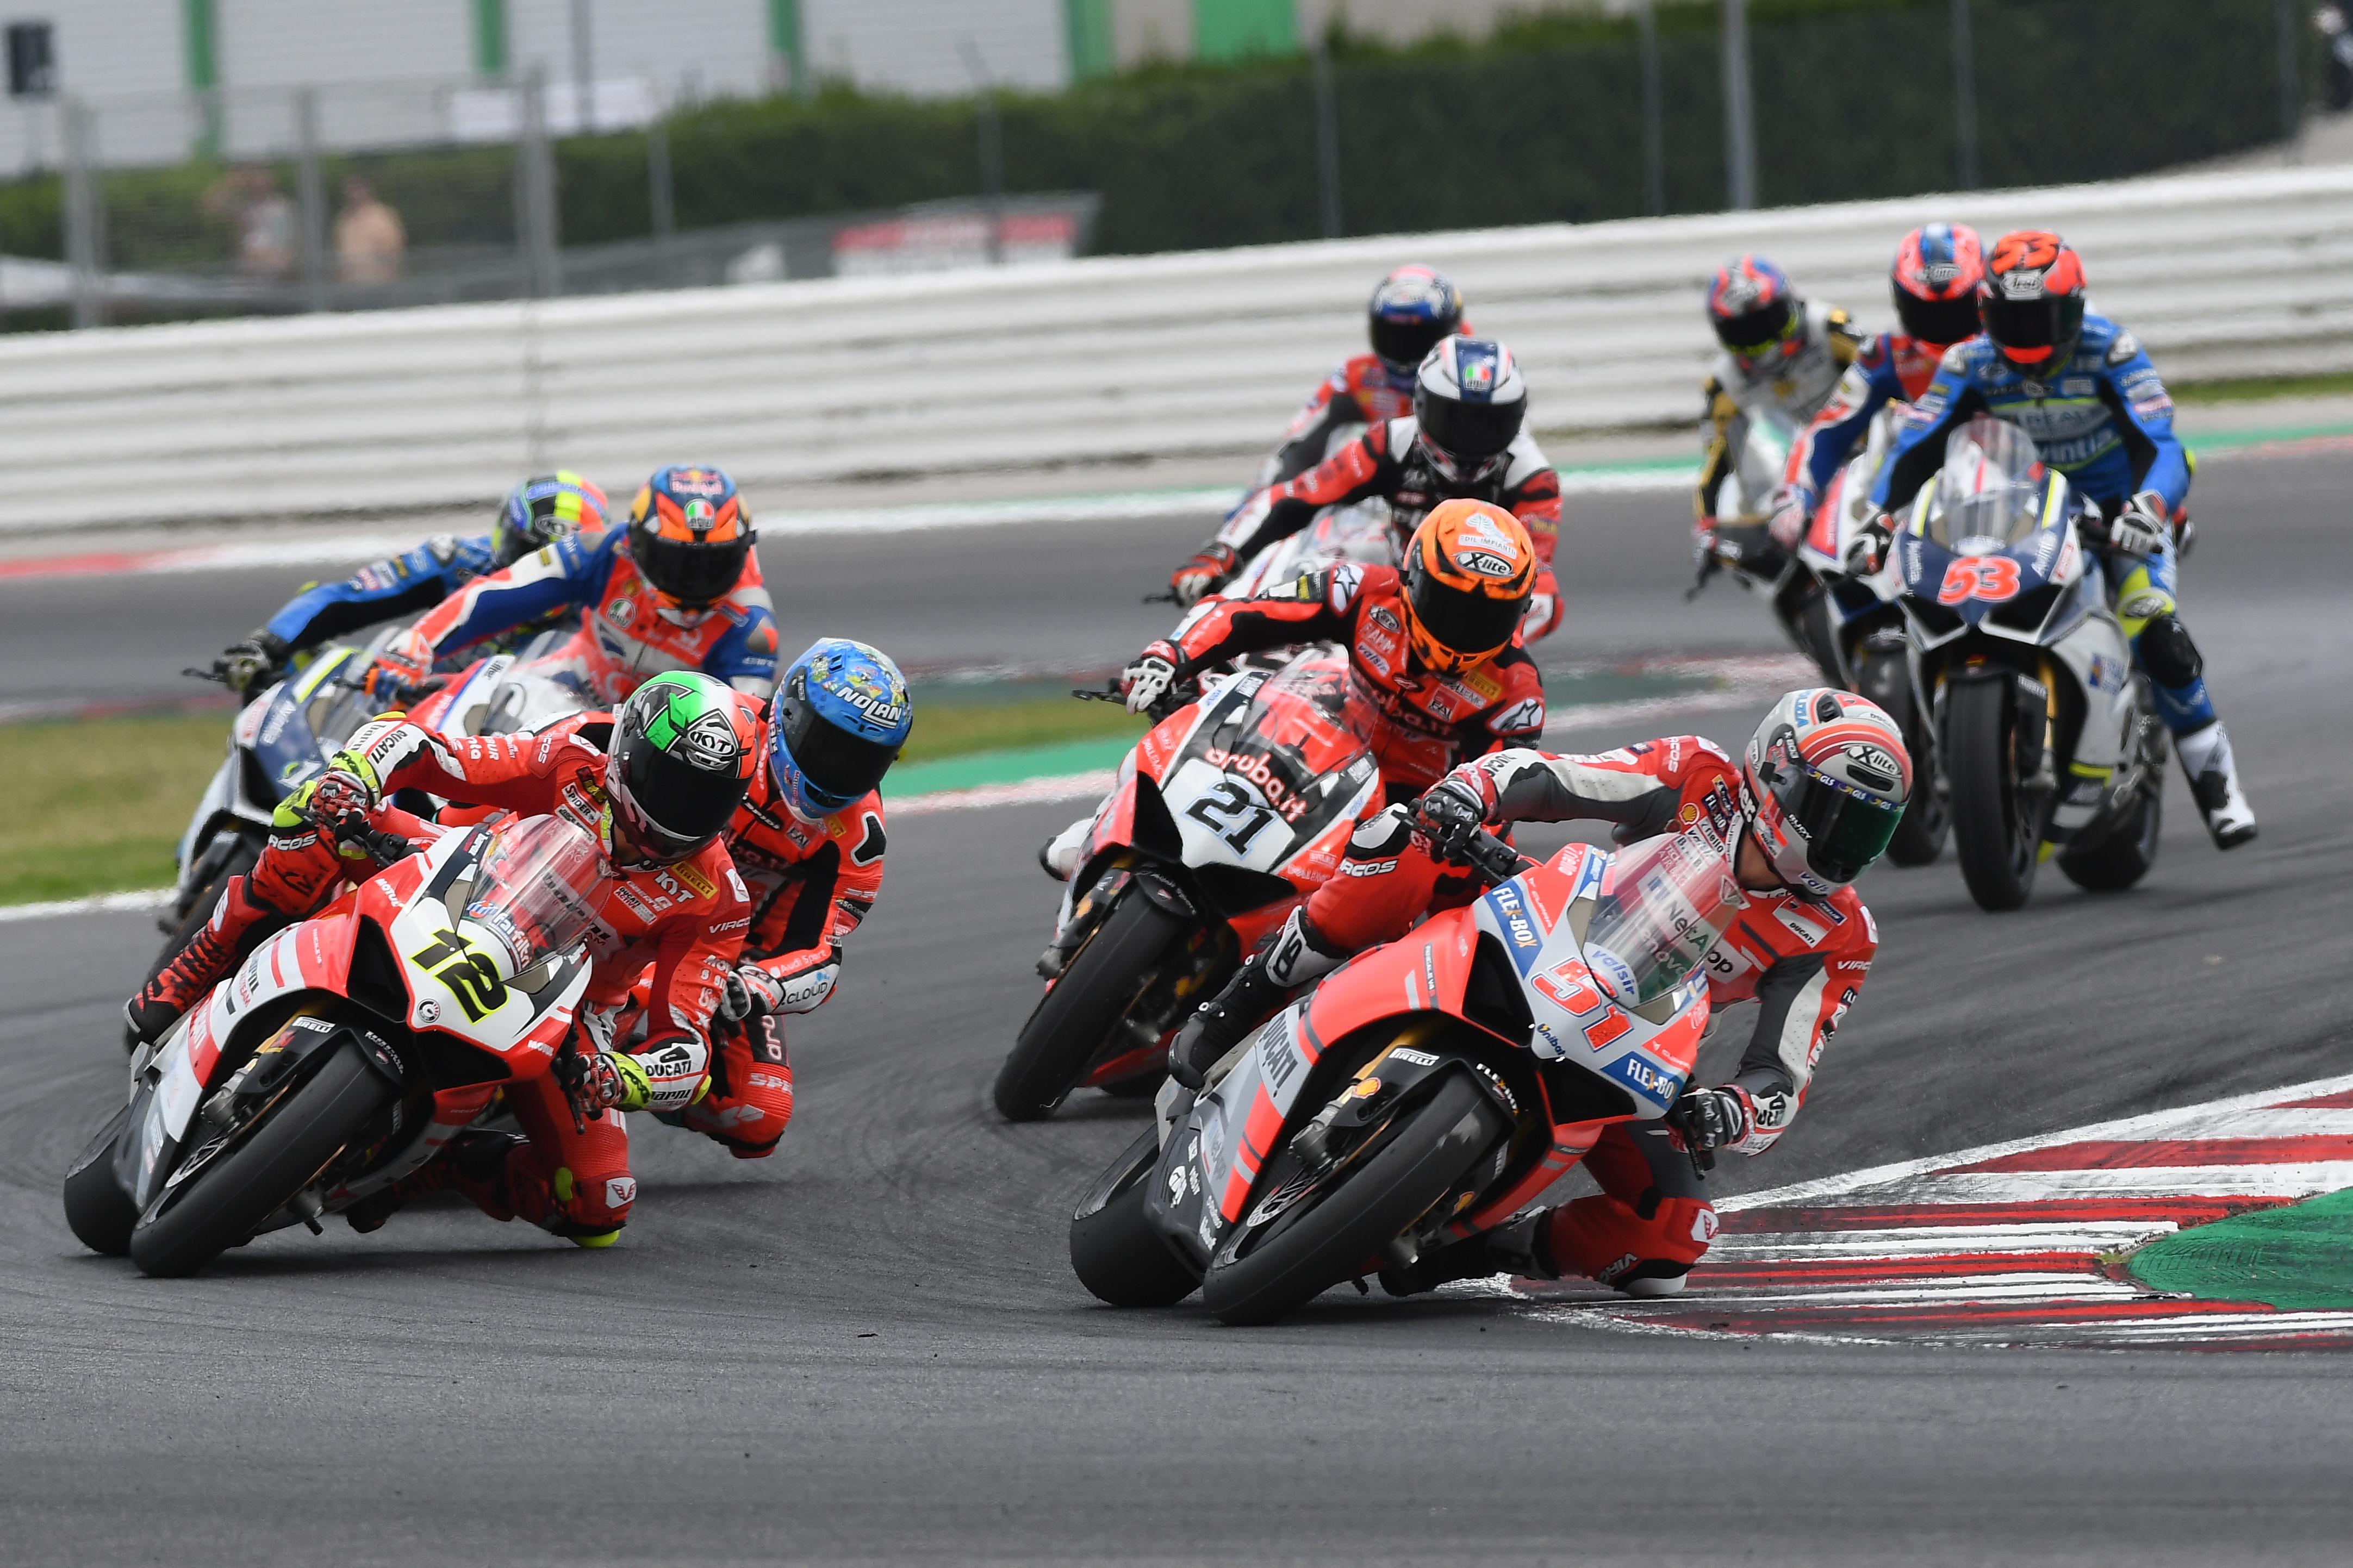 World Ducati Week 2018 Race of Champions